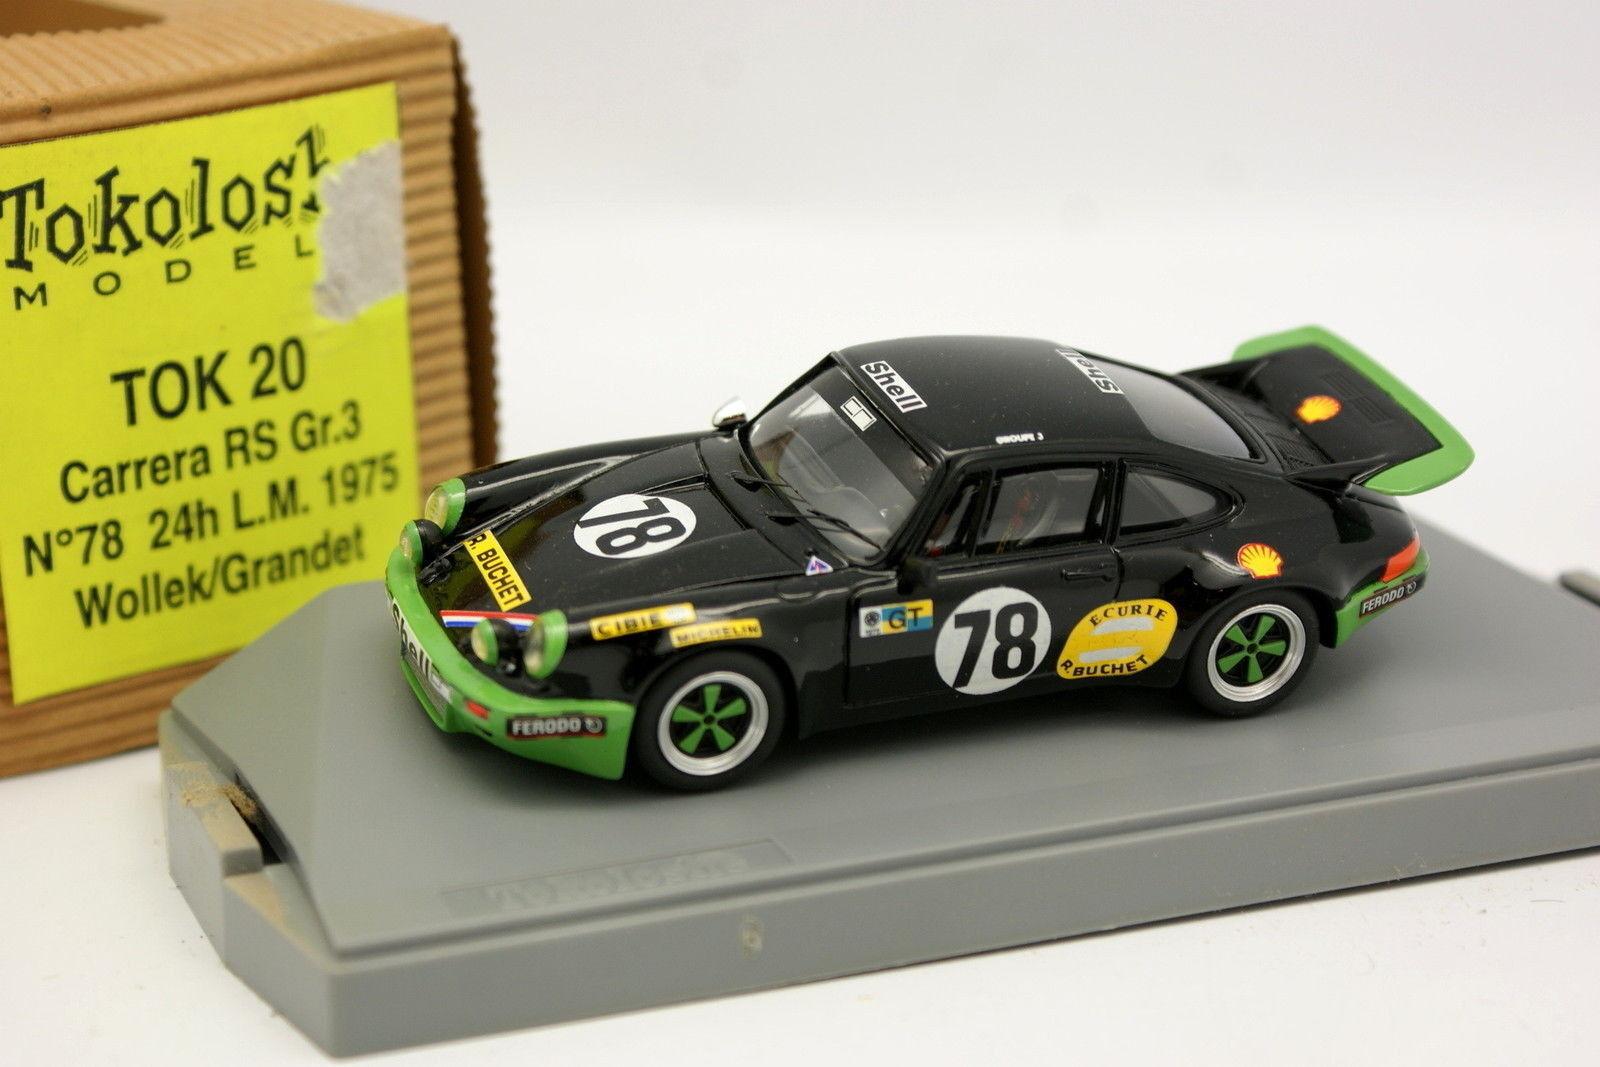 Tron tokoloshe 1 43 - porsche 911 carrera rs gr3 le mans 1975 n º 18